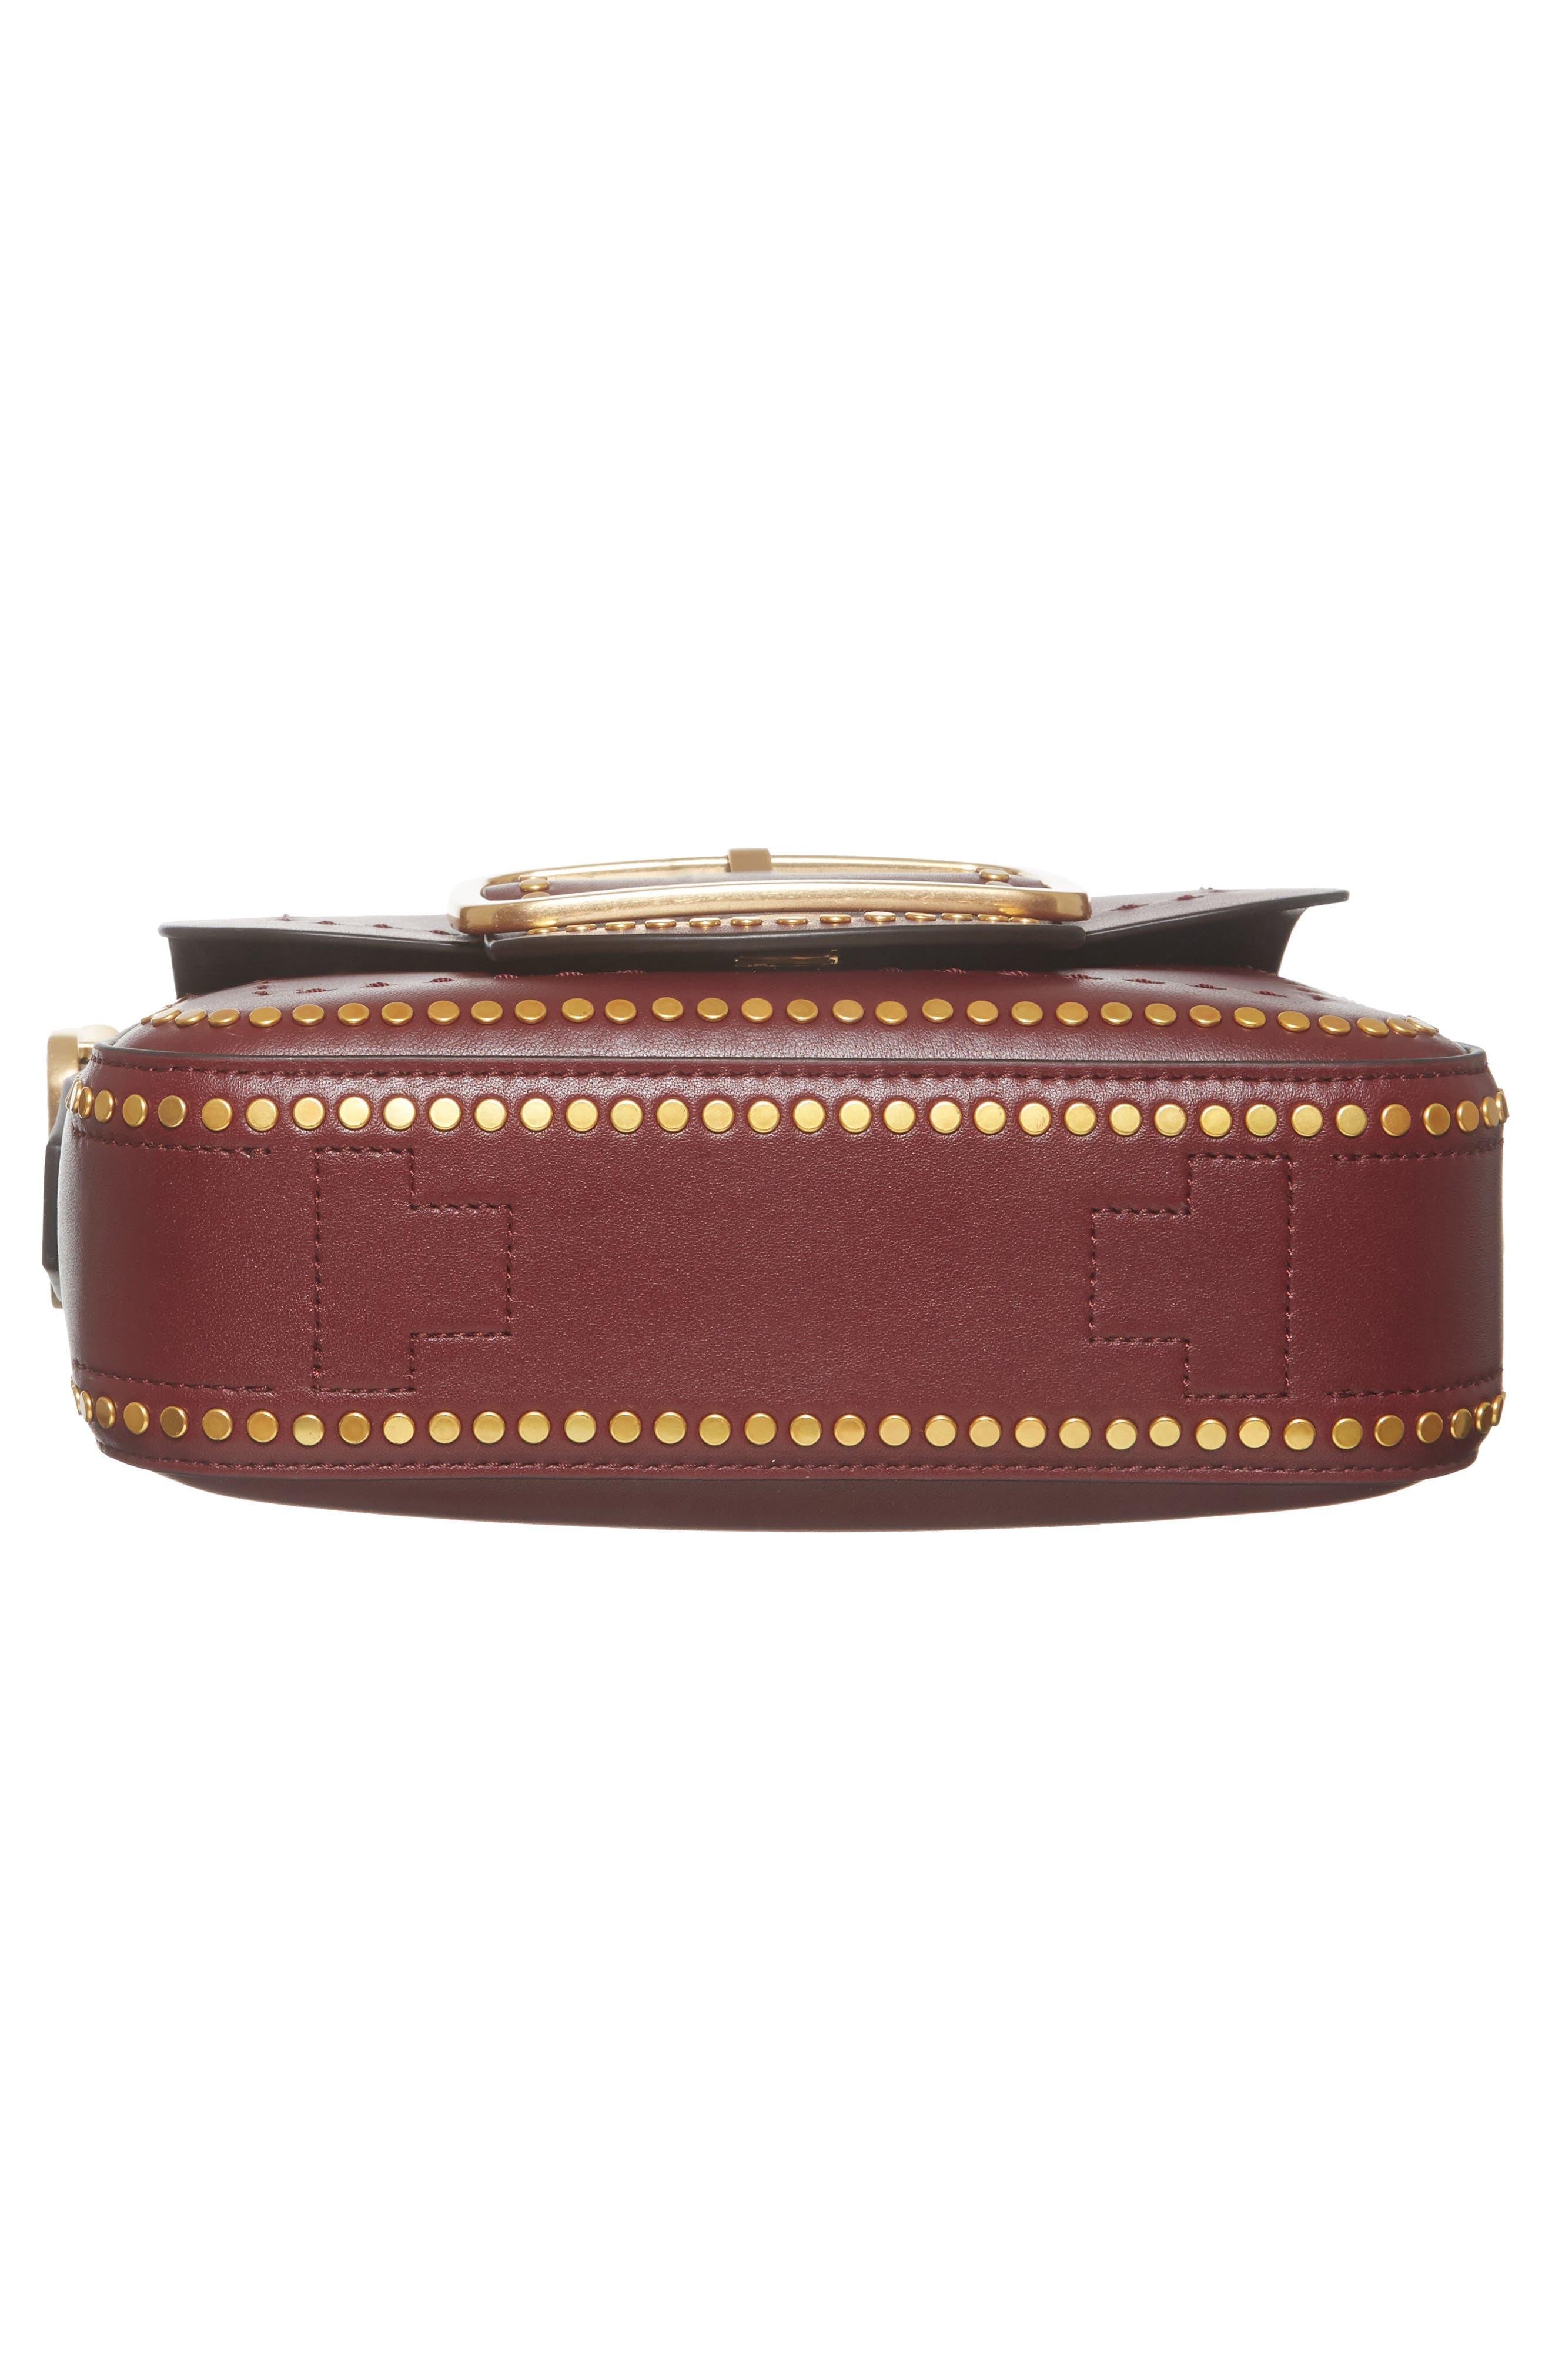 Small Sawyer Studded Leather Shoulder Bag,                             Alternate thumbnail 6, color,                             616